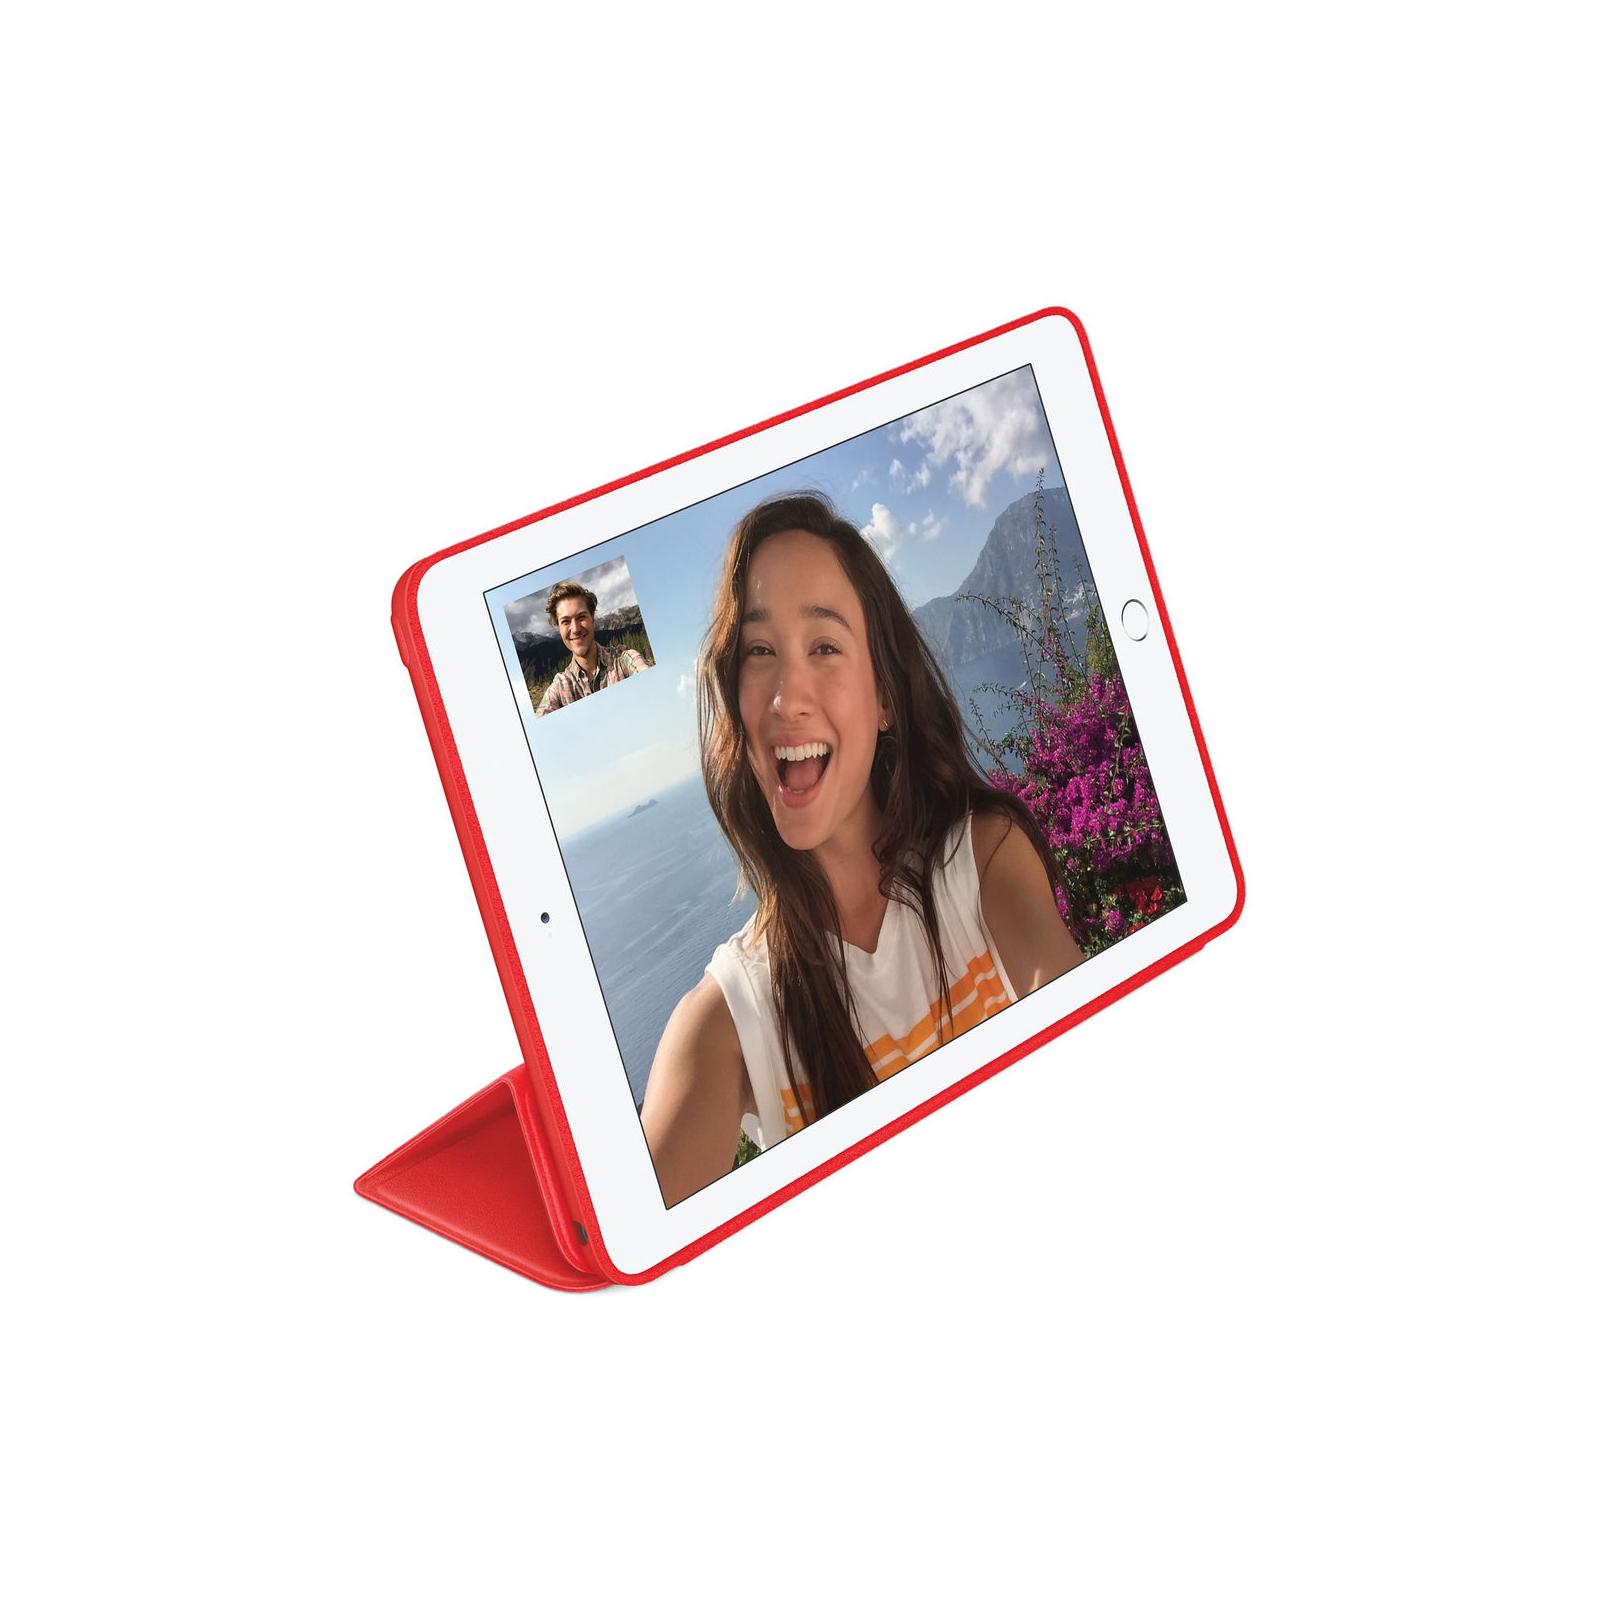 Чехол для планшета Apple Smart Case для iPad Air 2 (bright red) (MGTW2ZM/A) изображение 5